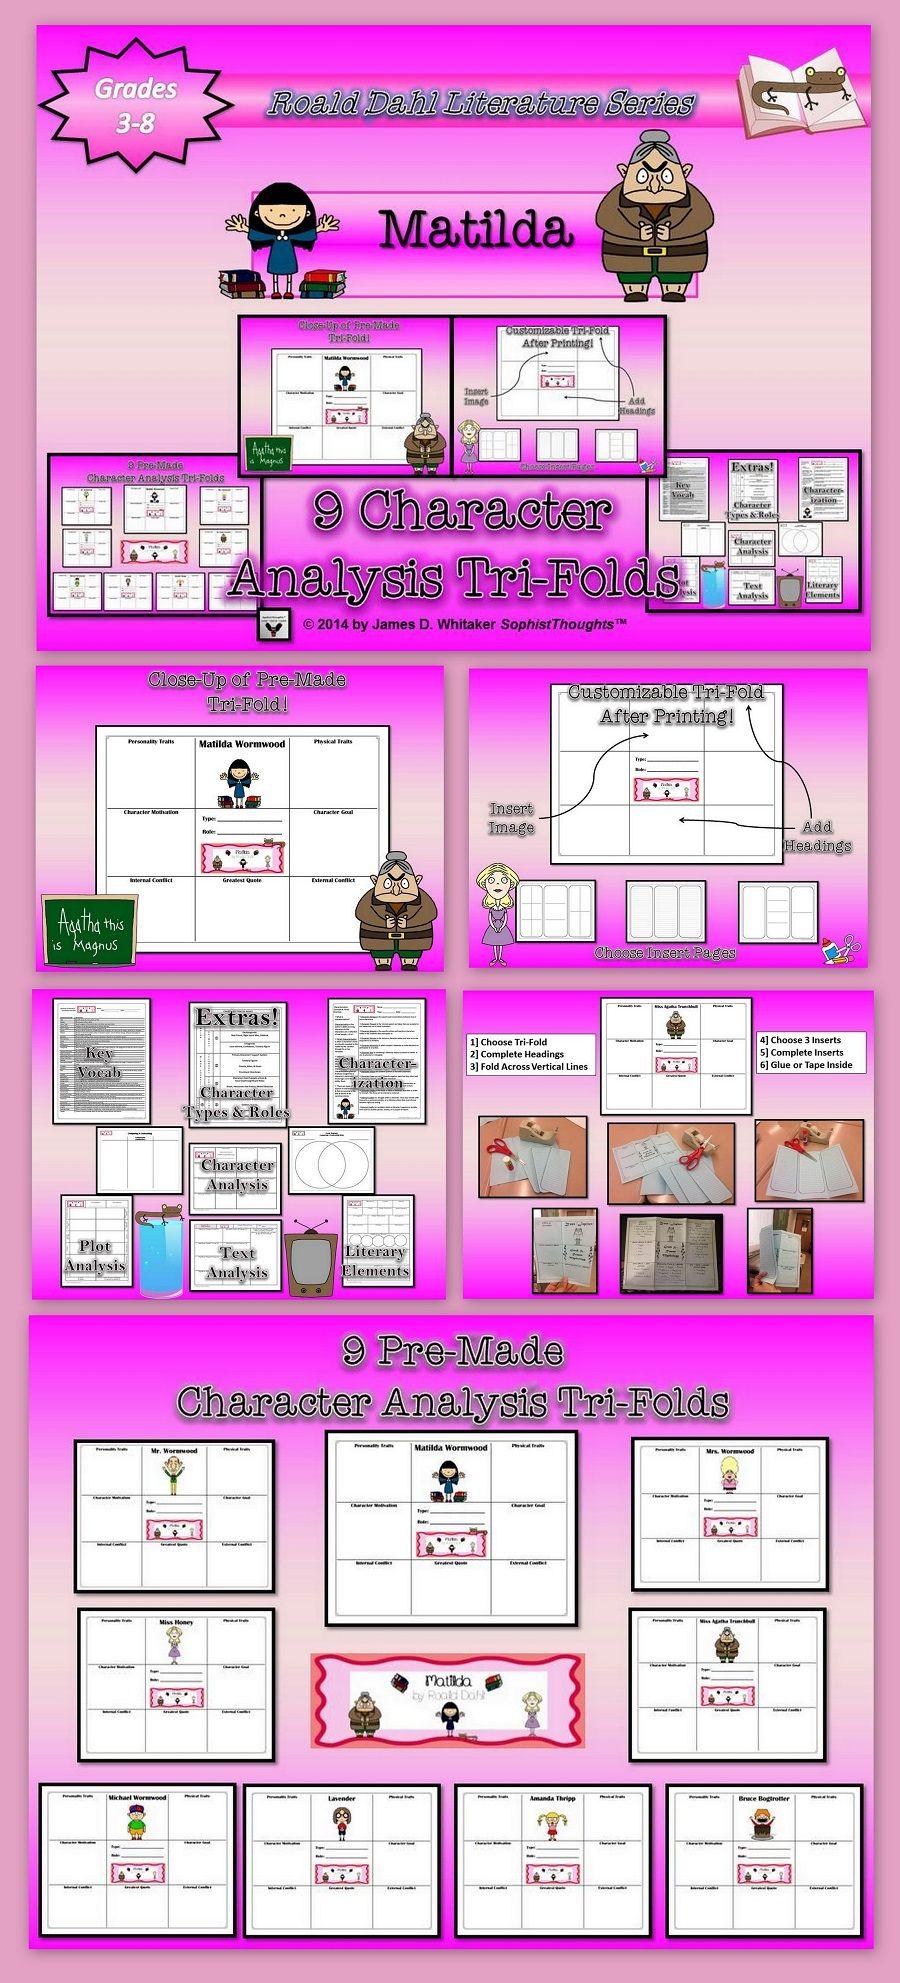 Workbooks the twits worksheets ks2 : Library display based on 'Matilda' by Roald Dahl, aimed at KS2 ...